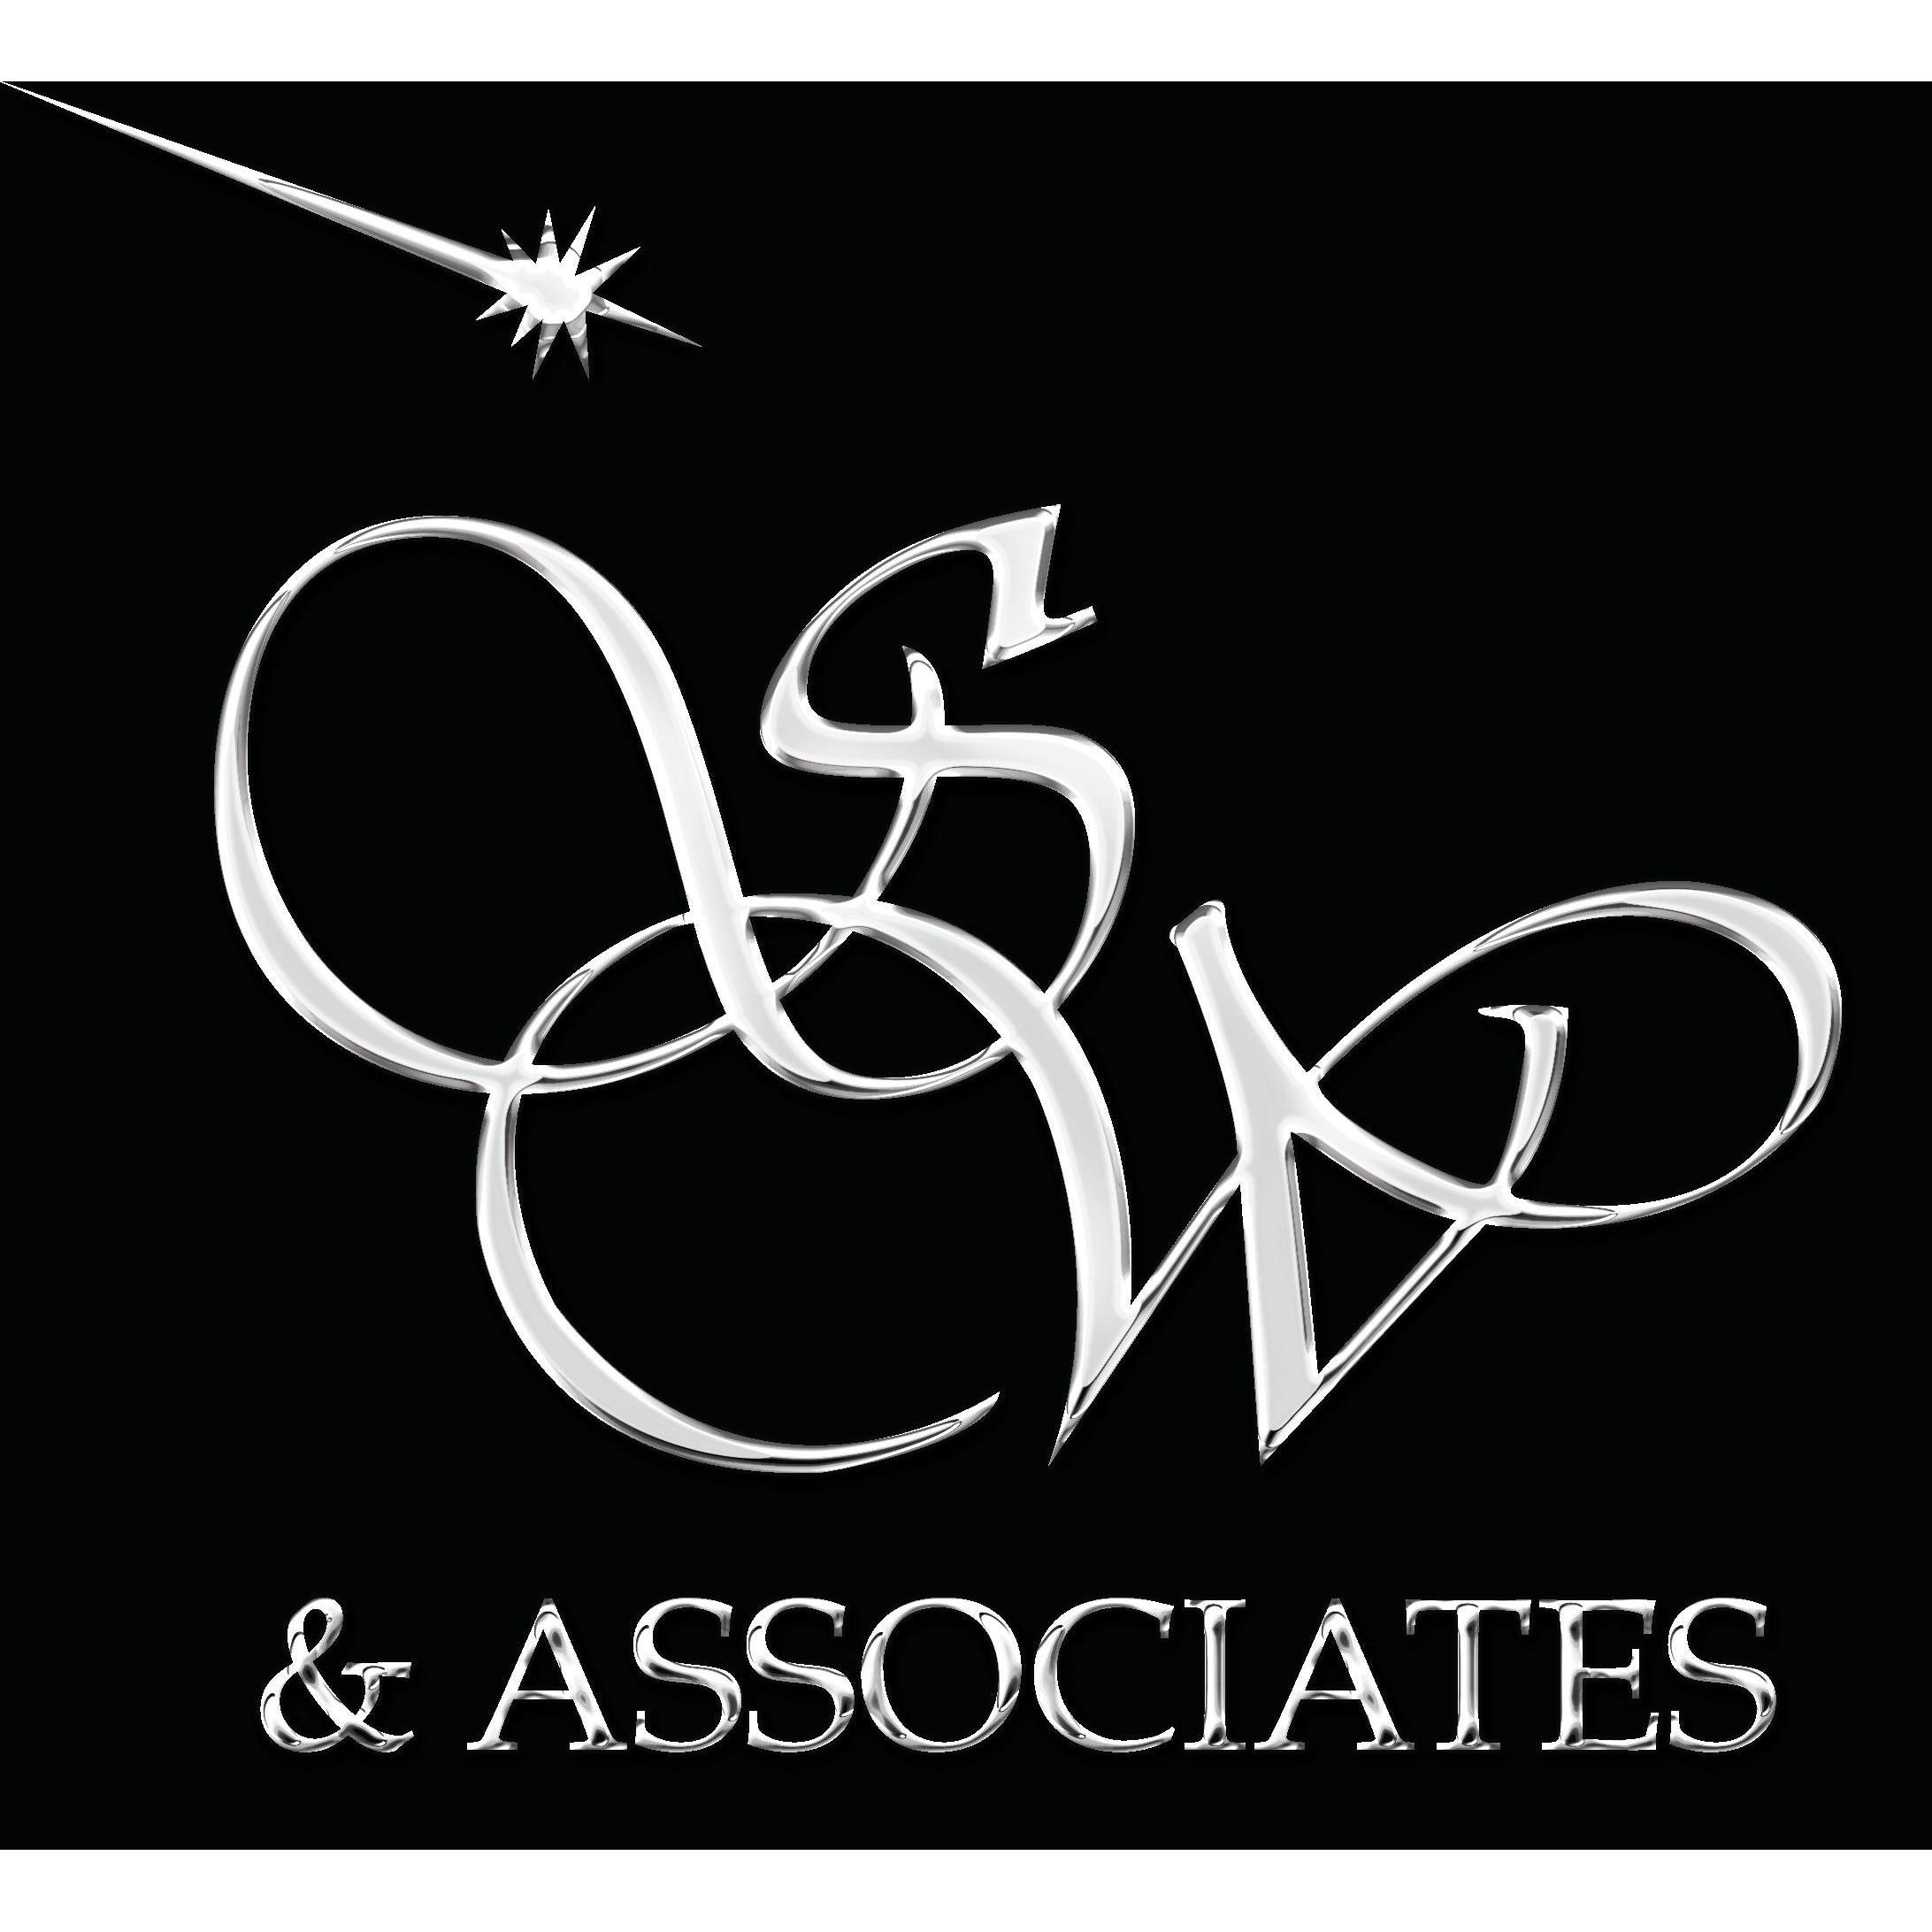 Savage Walker & Associates - Glendale, AZ - Real Estate Agents